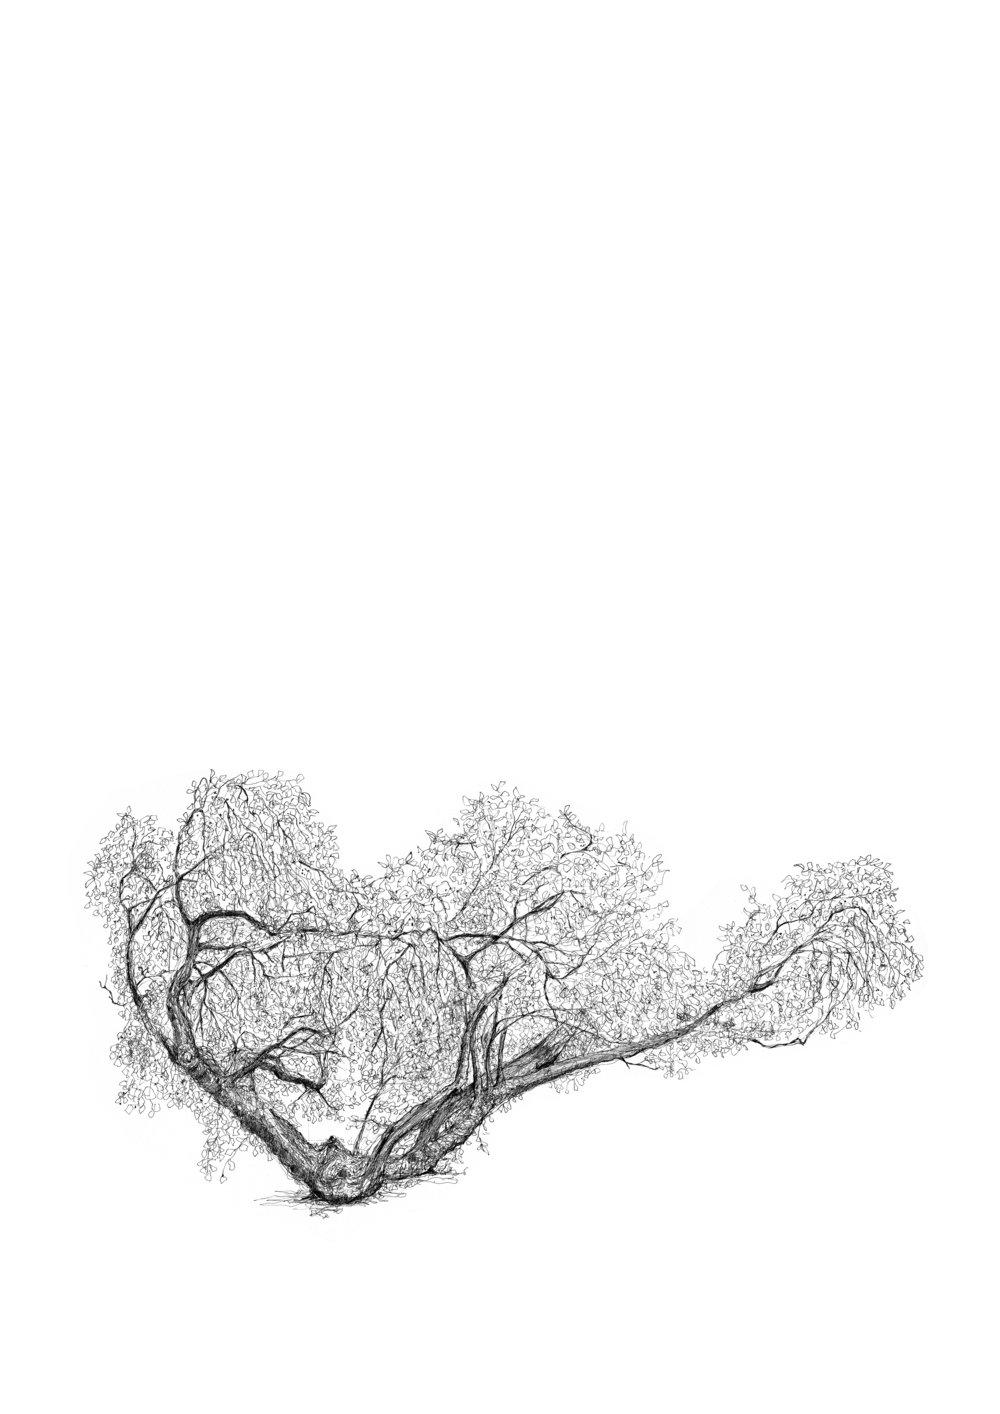 charlton house mulberry Tree - Luke Adam Hawker.jpg